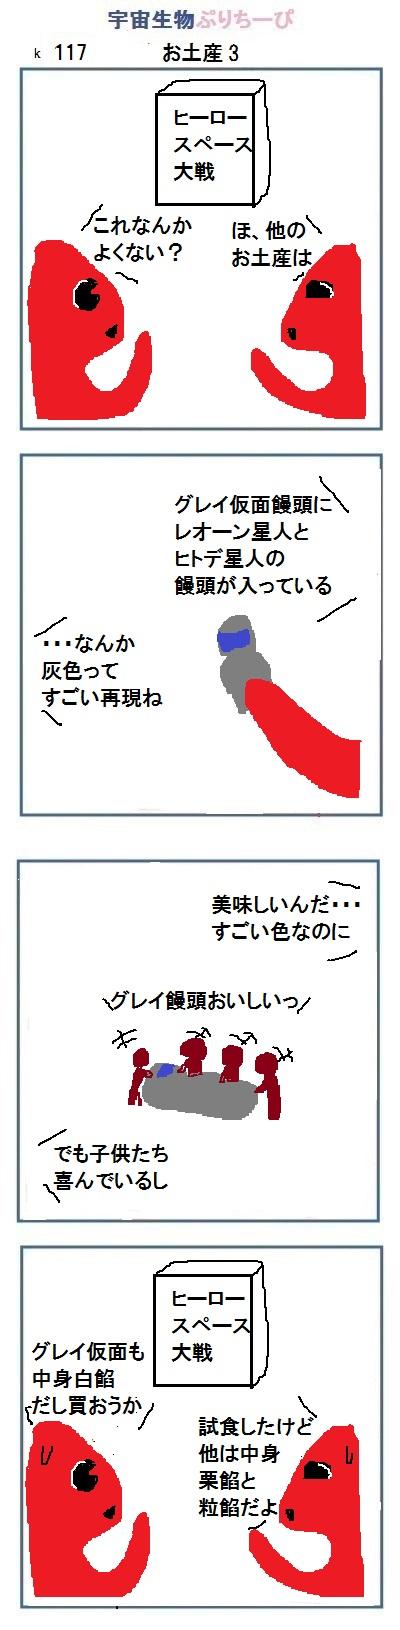 160930_k117.jpg